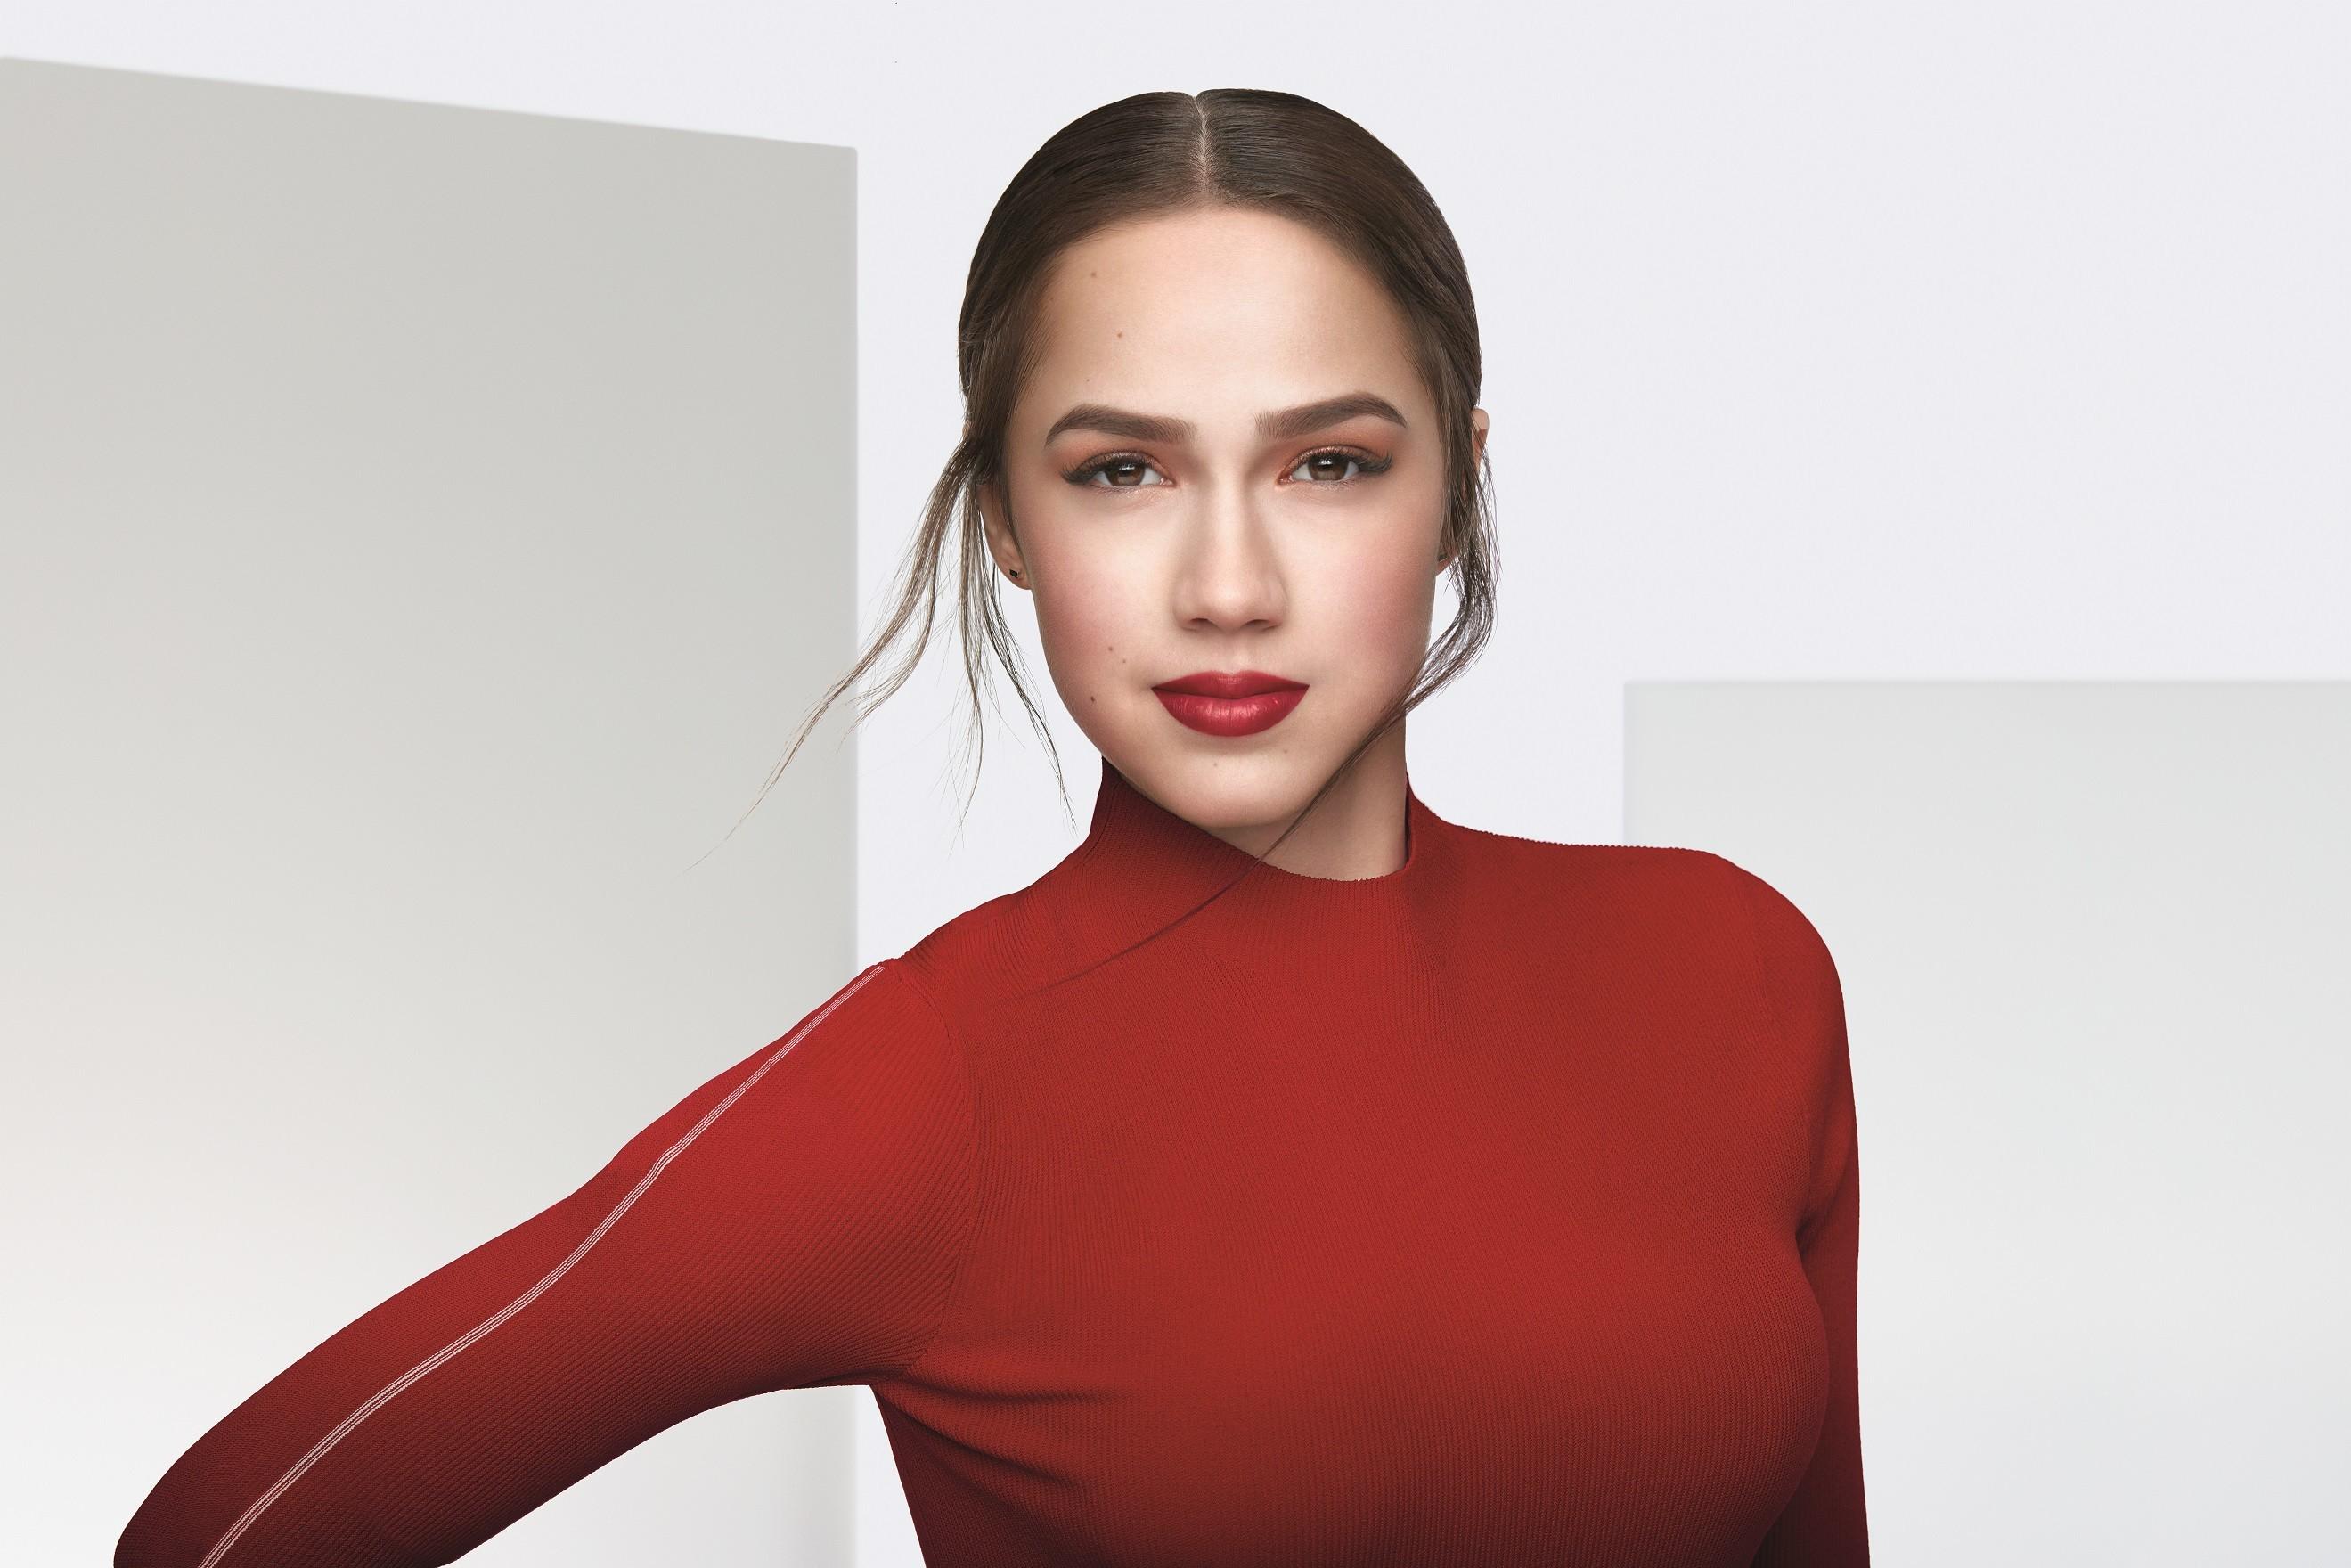 "<p>Фото © <a href=""https://www.shiseidogroup.jp/news/detail.html?n=00000000002795"" target=""_self"">shiseidogroup.jp</a></p>"